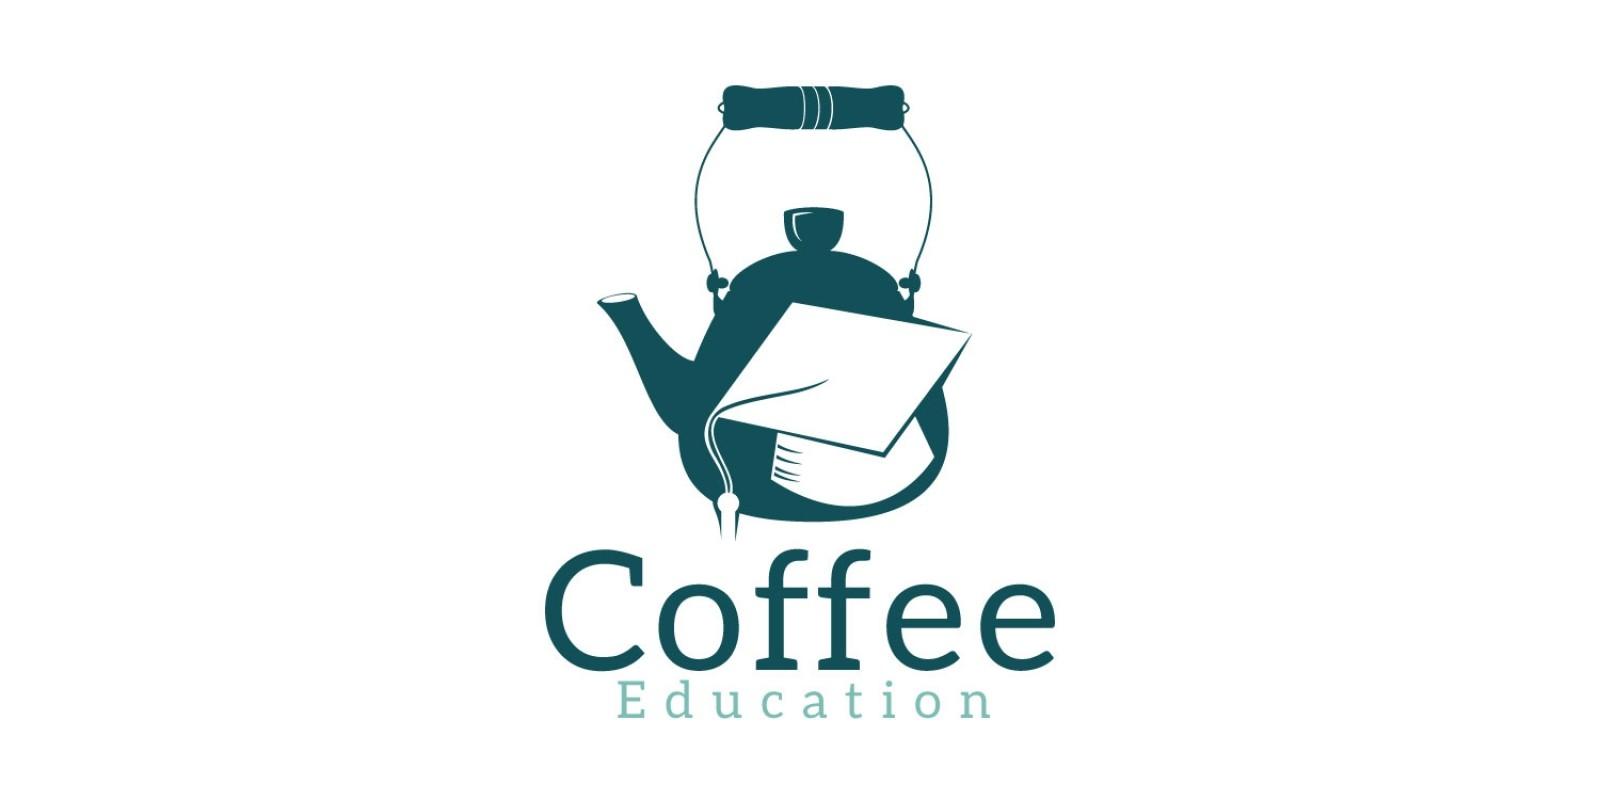 Coffee Education Logo Design